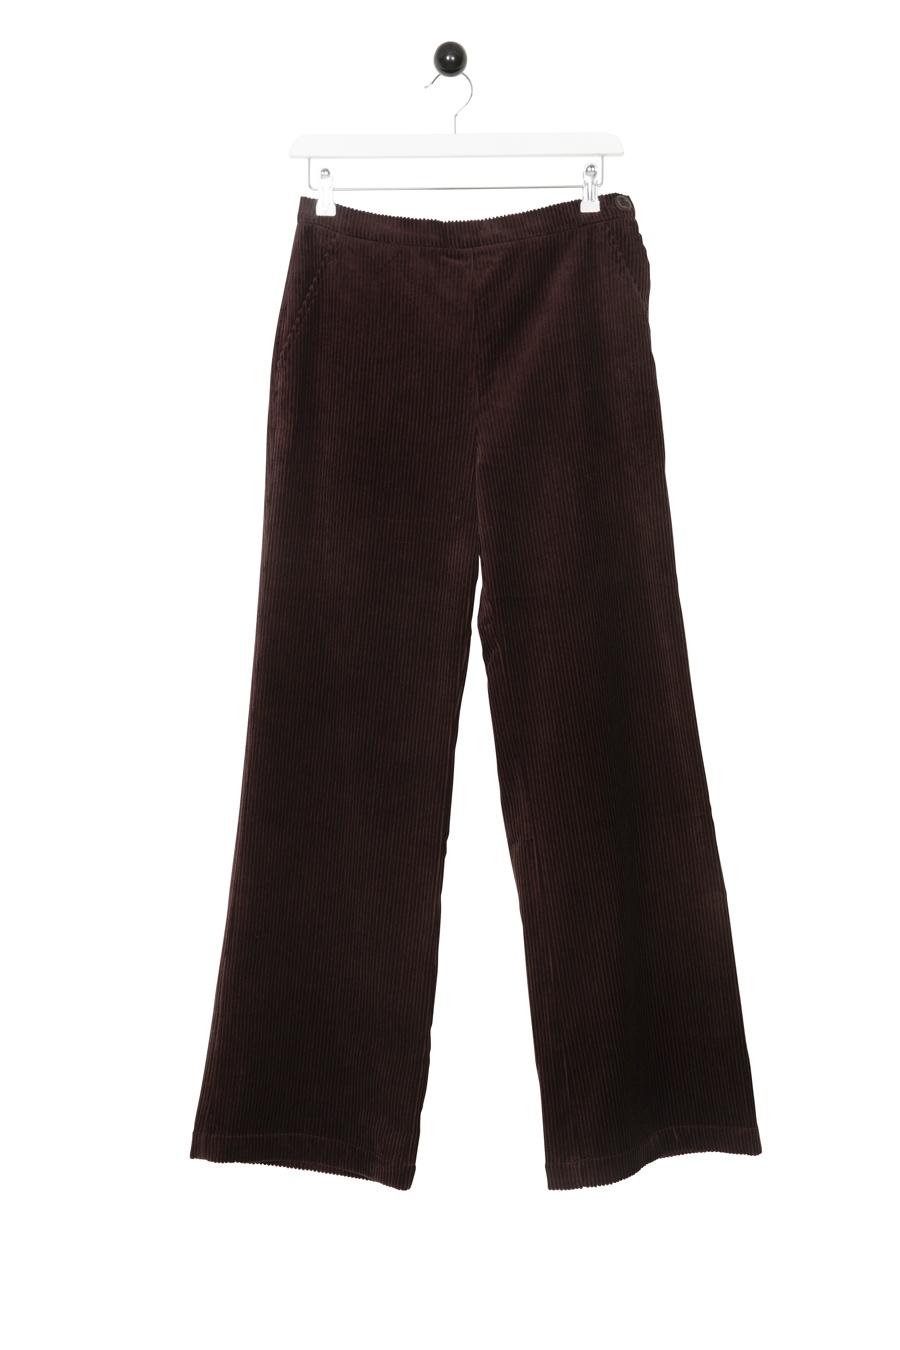 Return Melvish Trousers